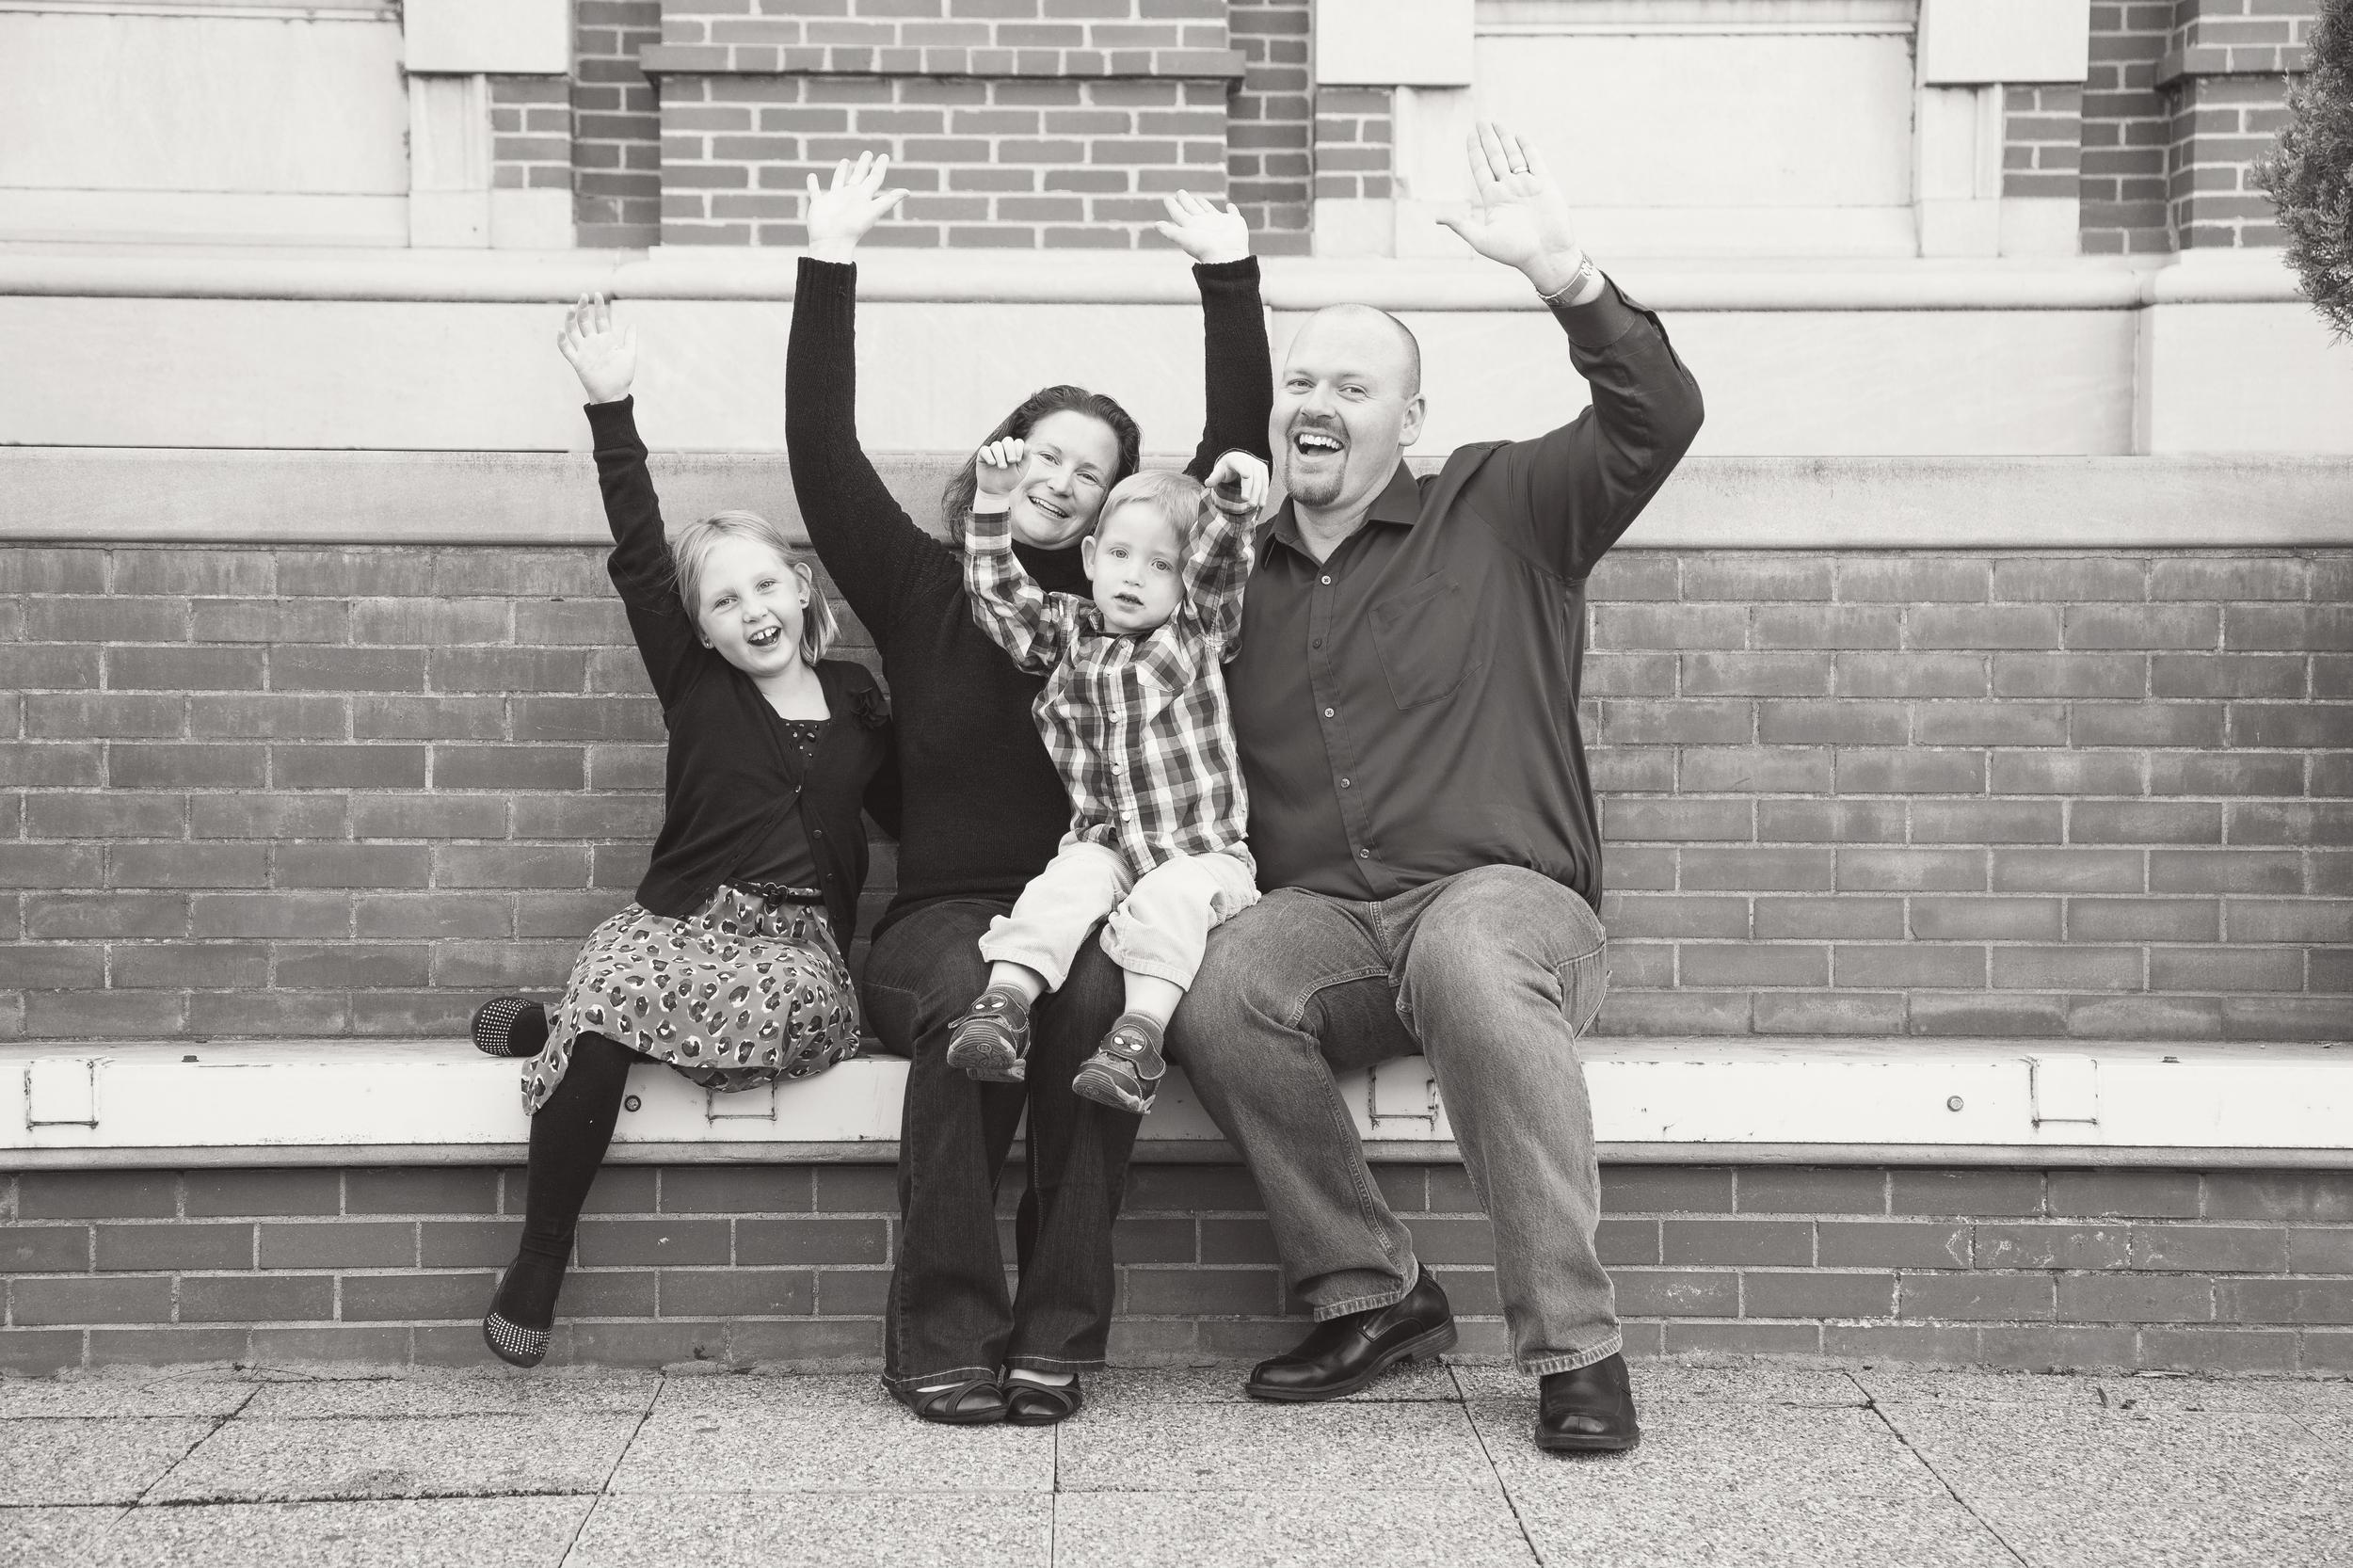 Family_Photos_2014_010_bw.jpg